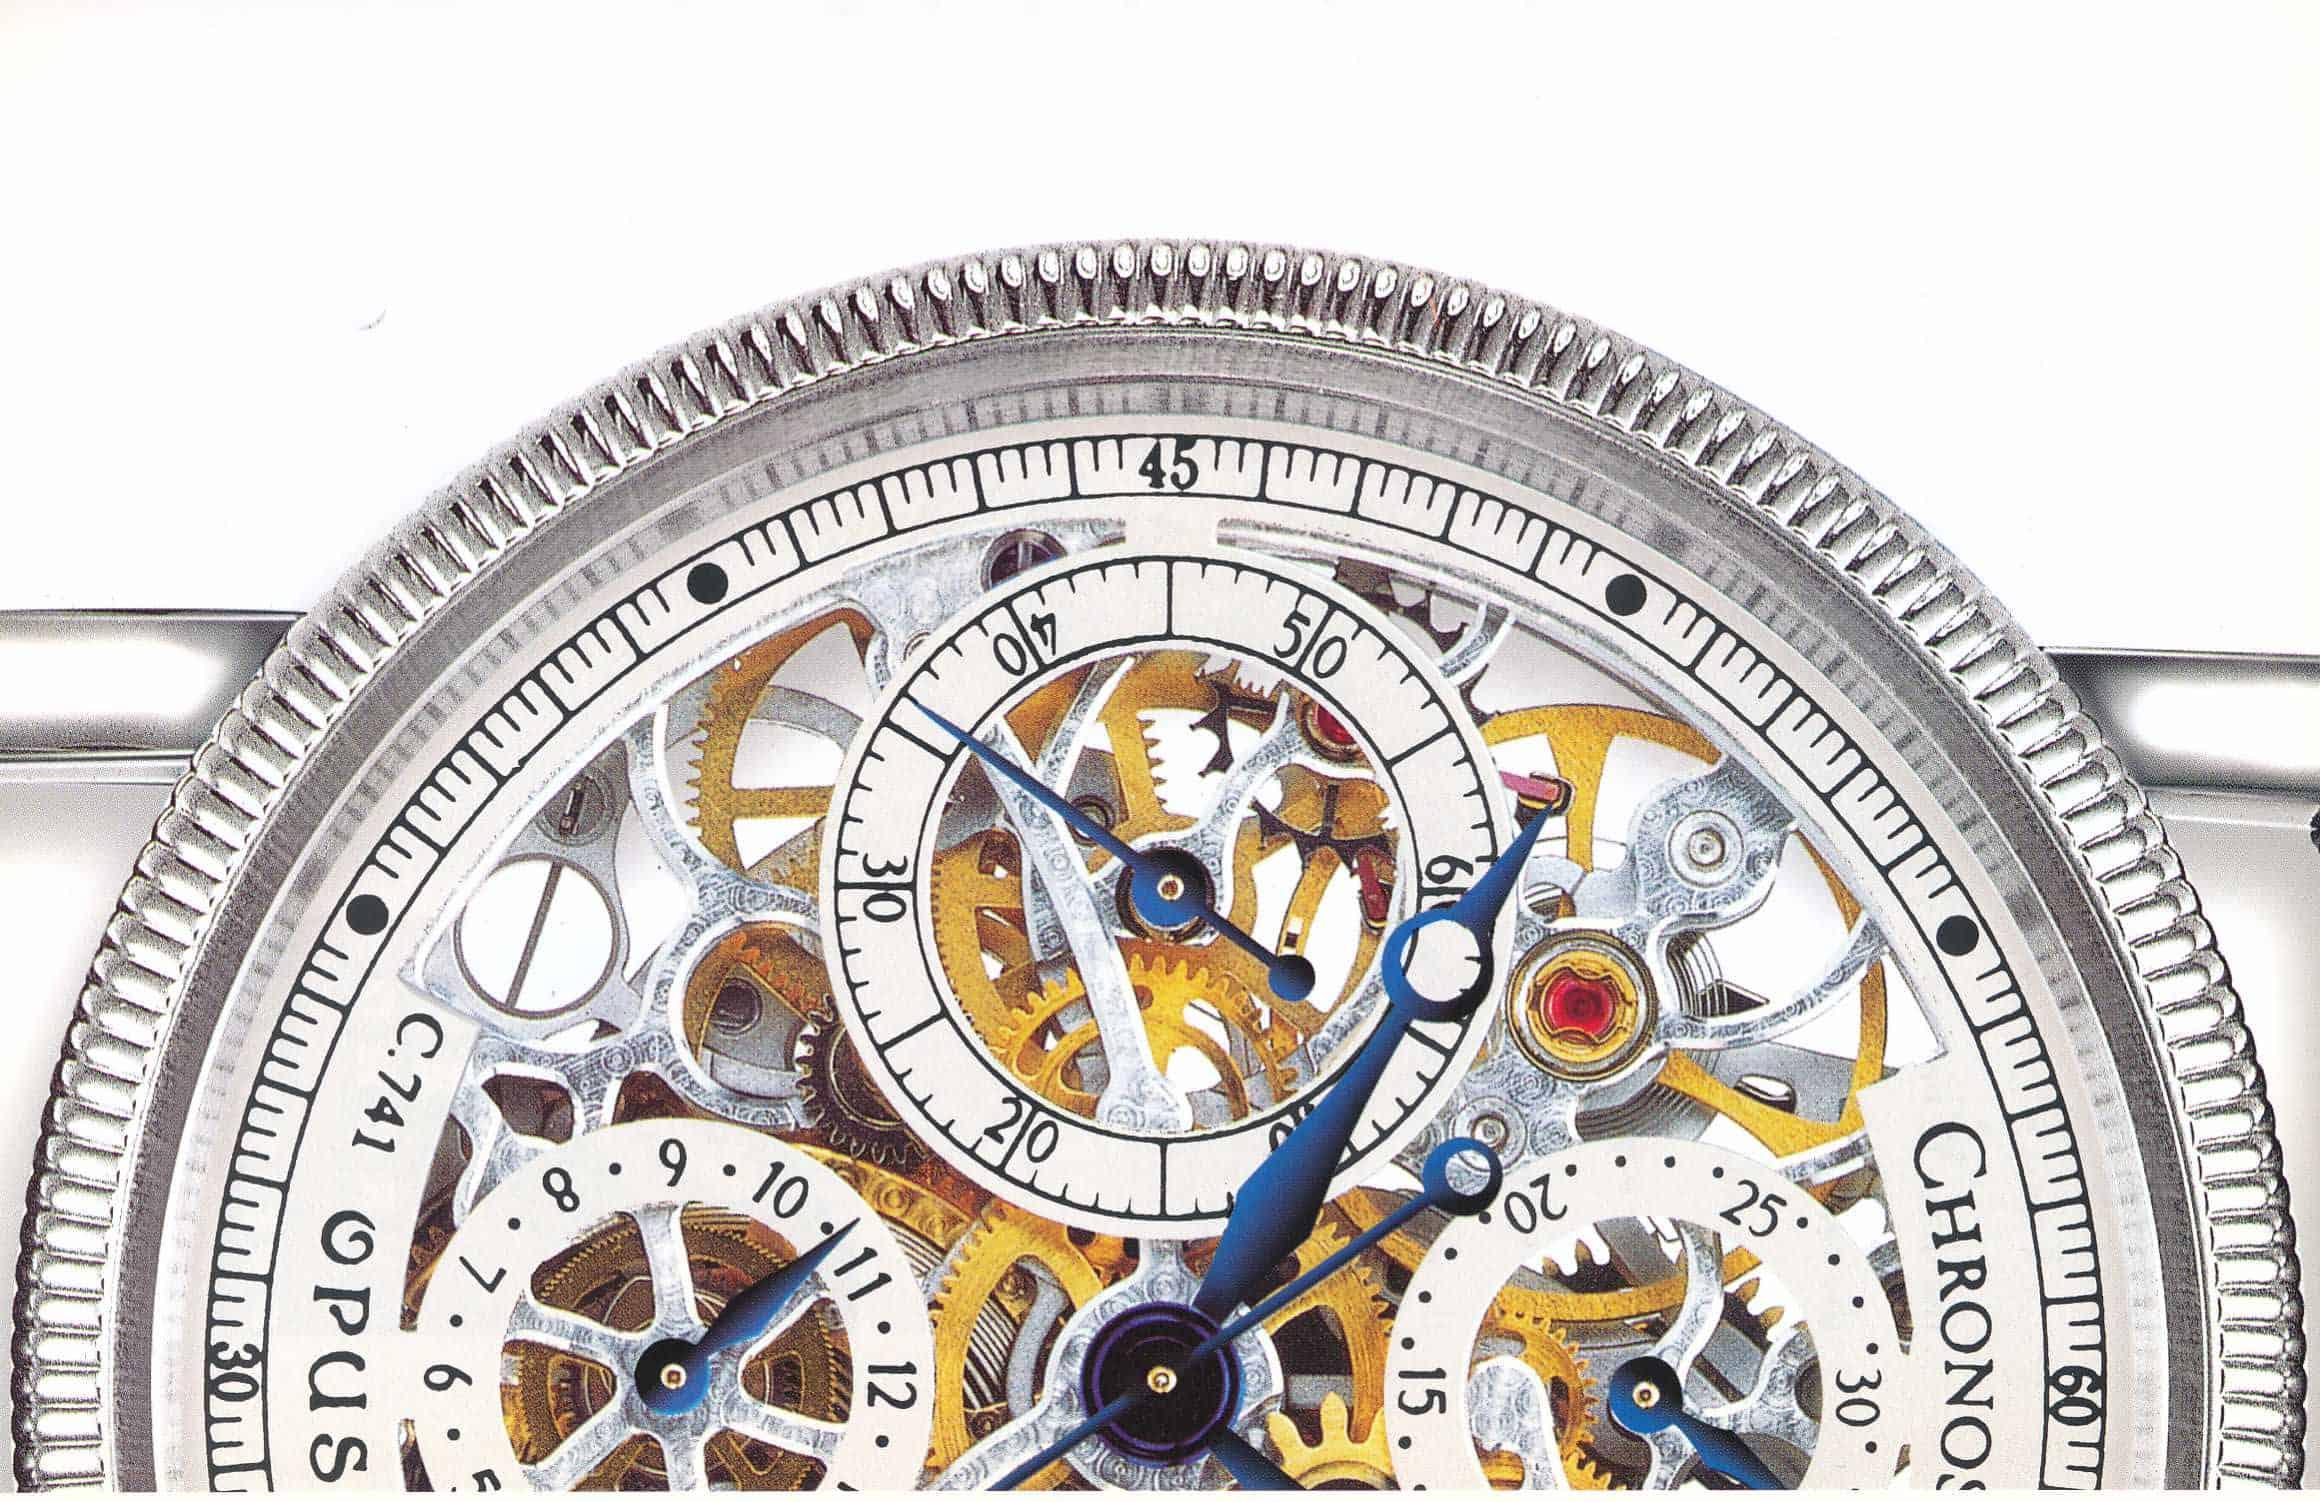 Historischer Chronograph Chronoswiss Opus Referenz 7523